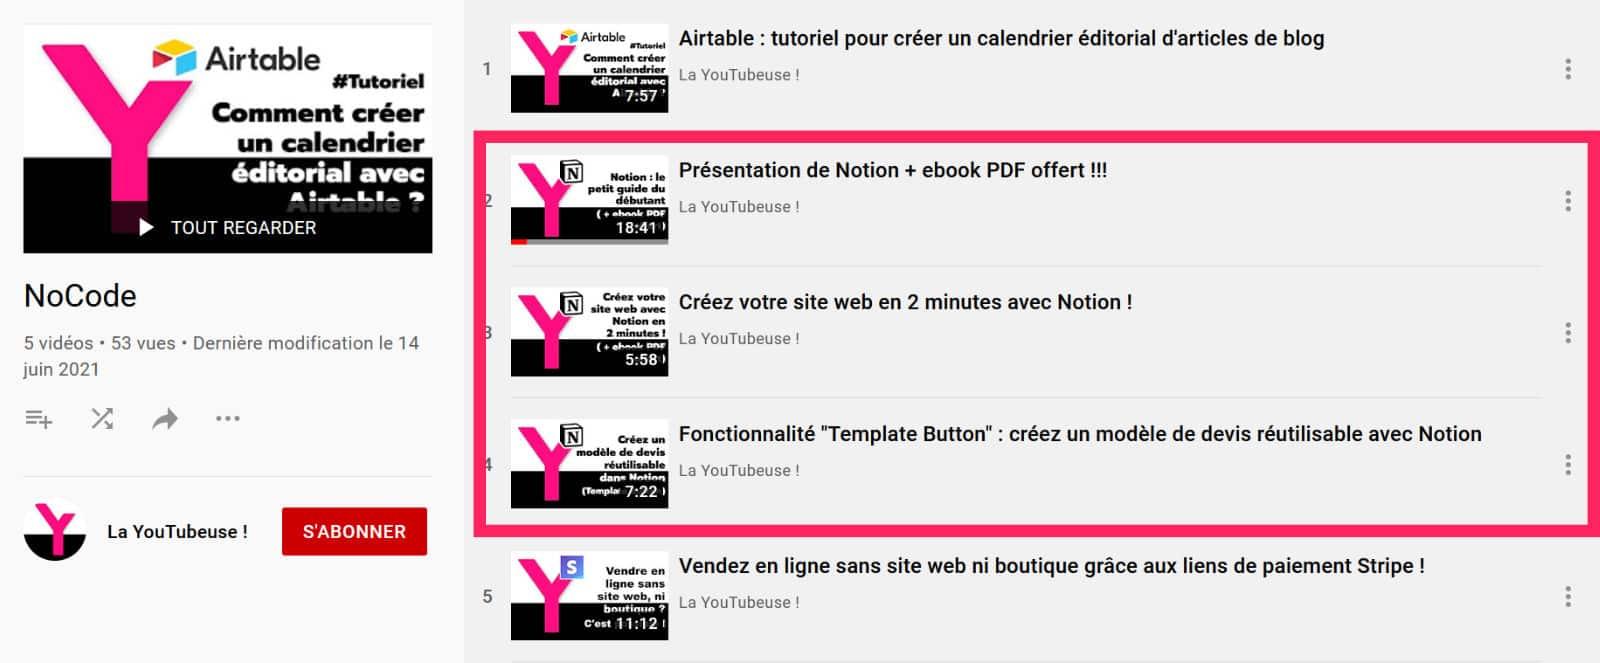 Chaine YouTube Notion La Webeuse